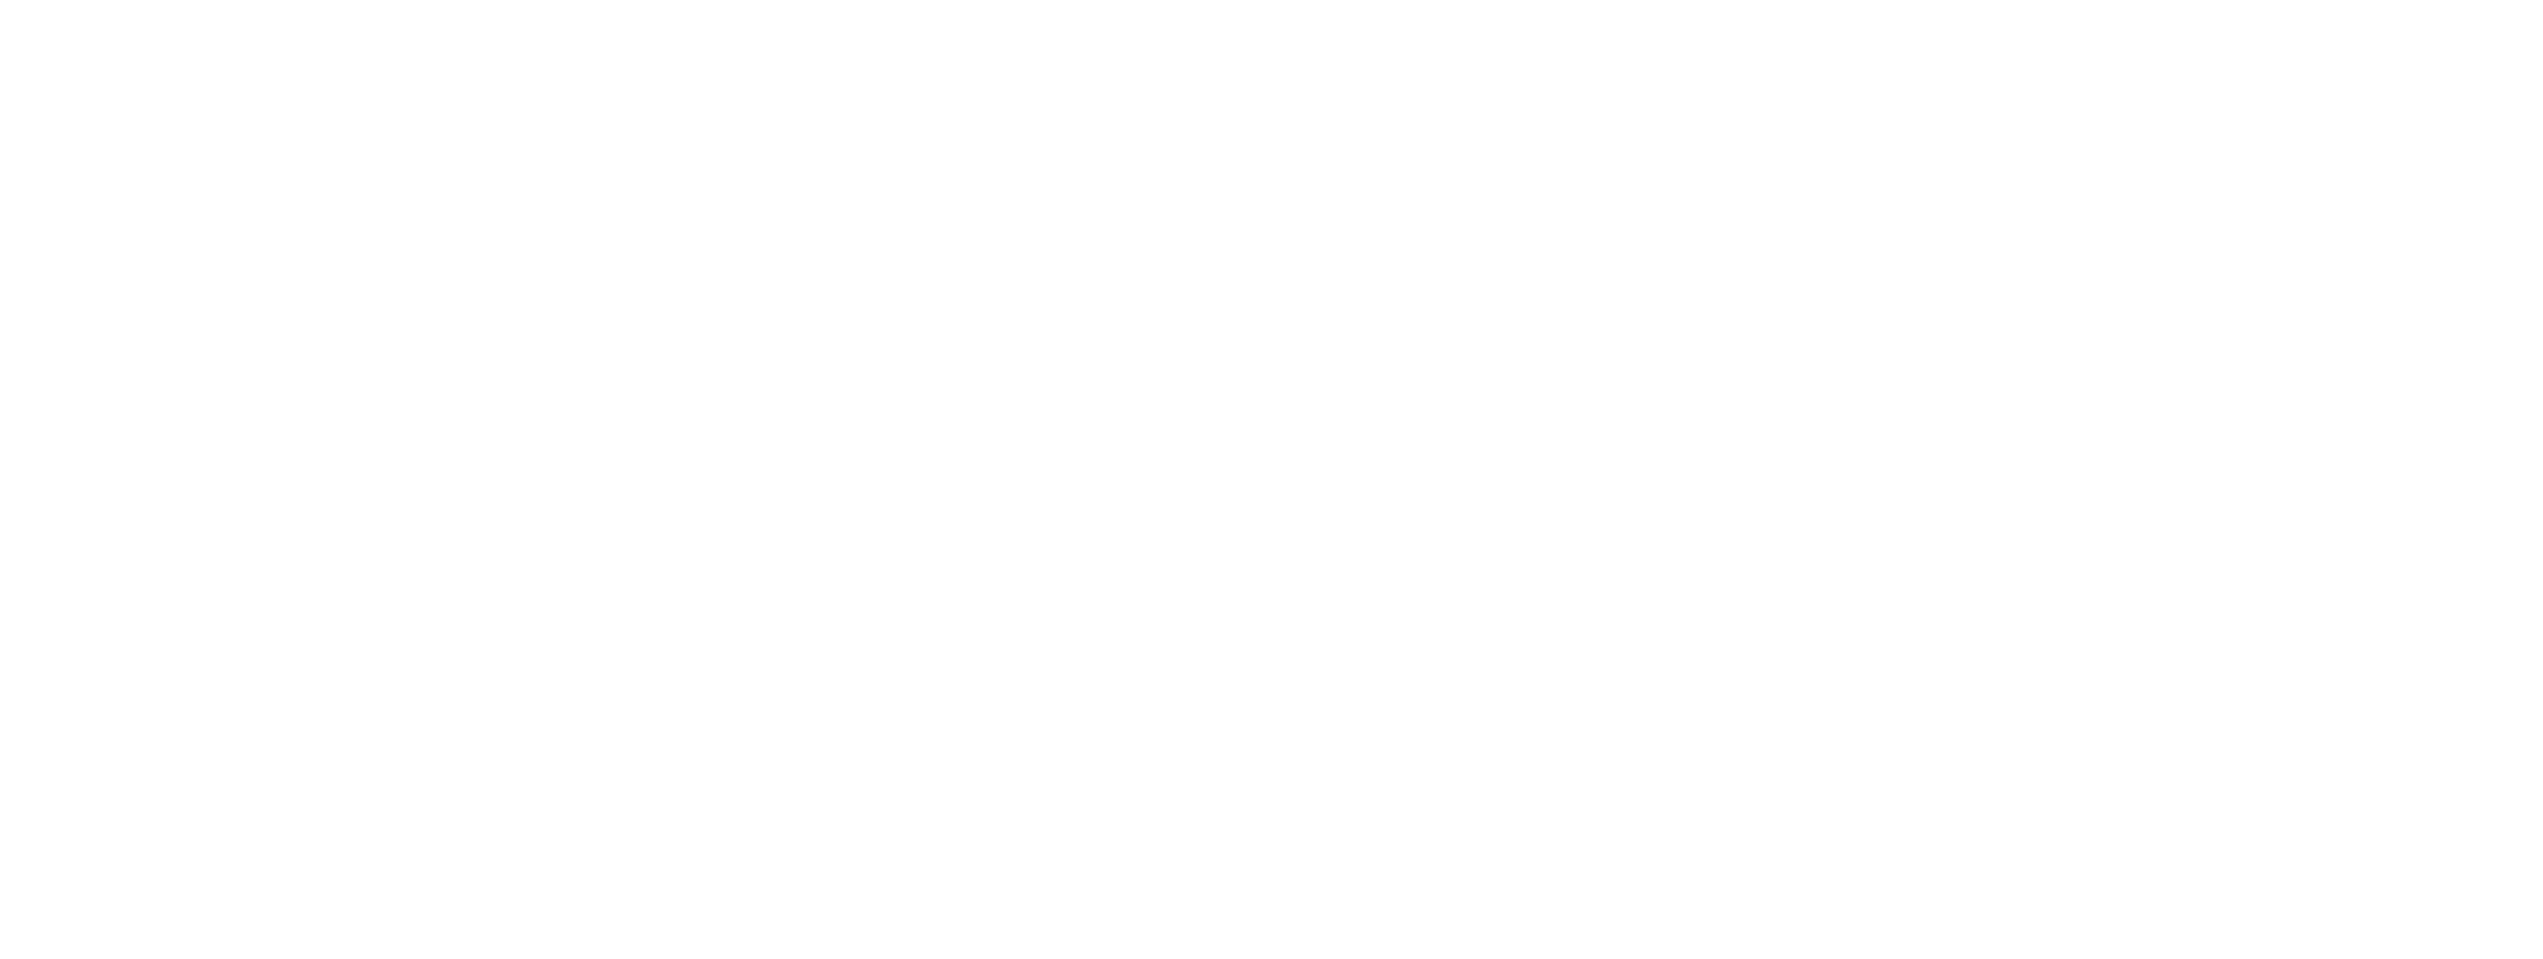 RE/MAX Hochland